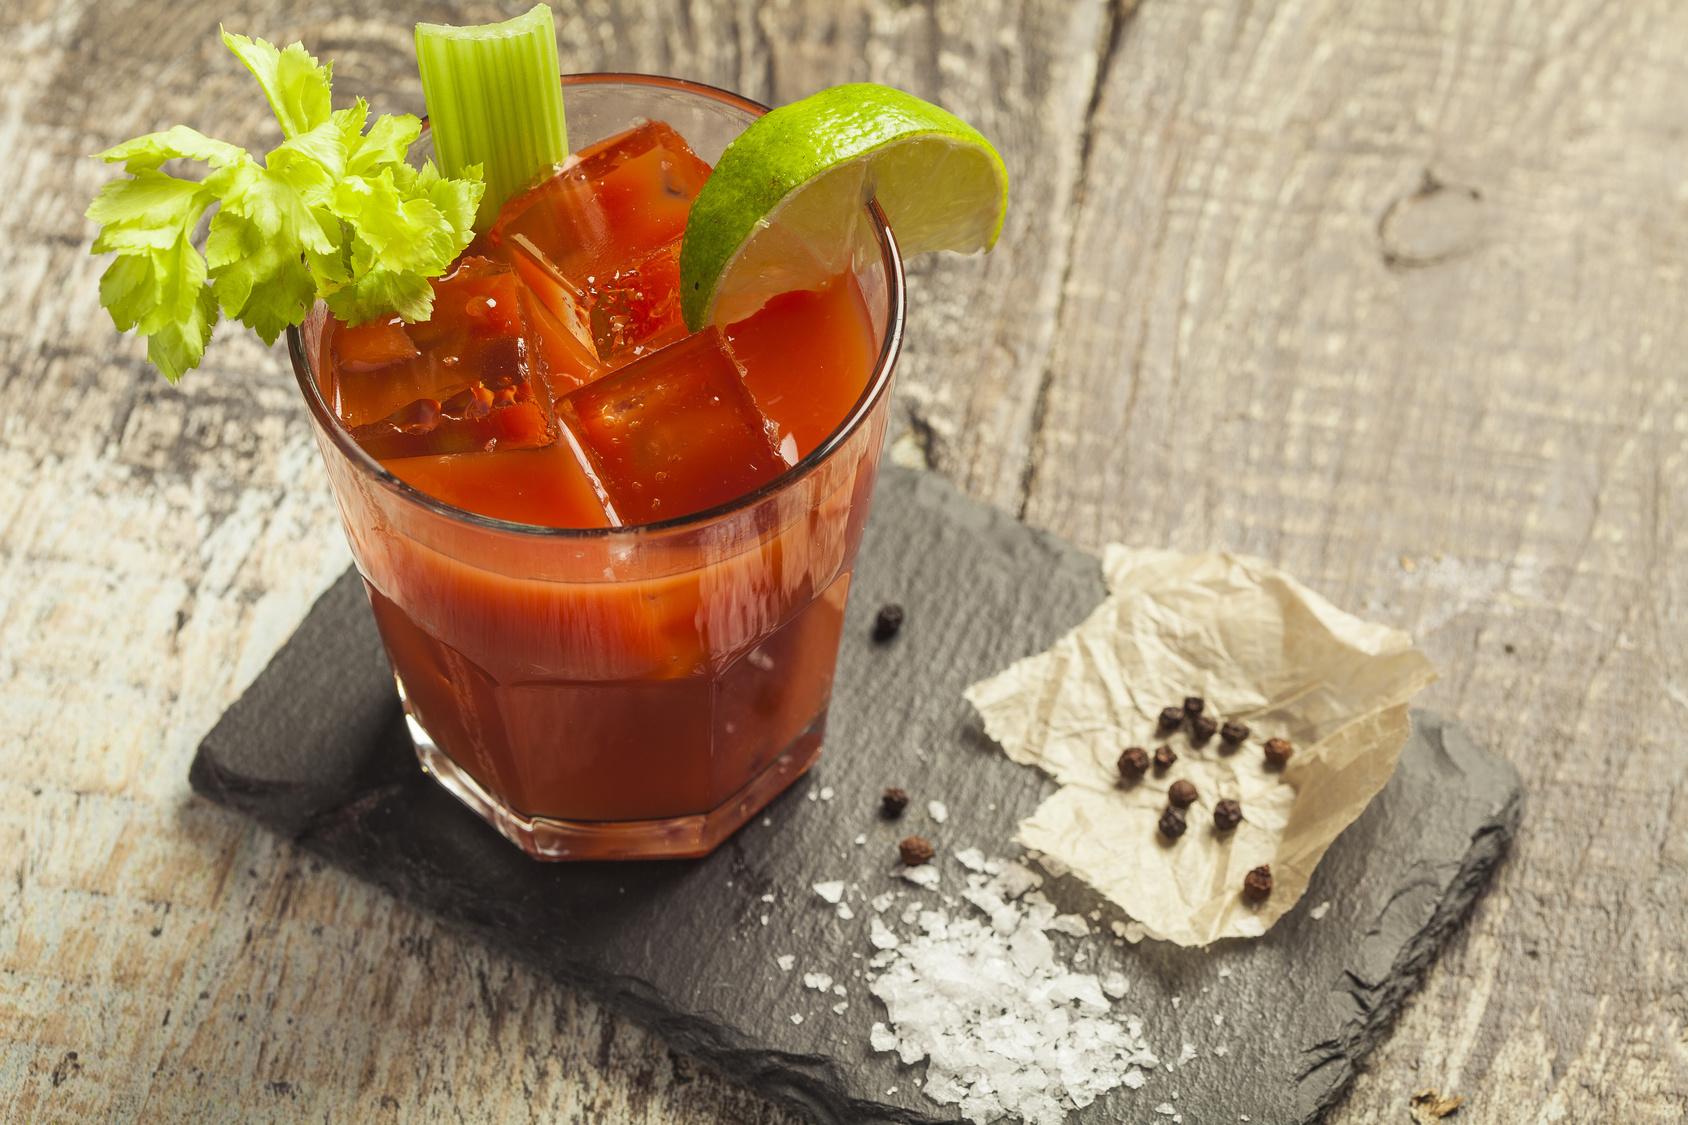 Receitas: 5 receitas de drinks para esquentar o seu inverno